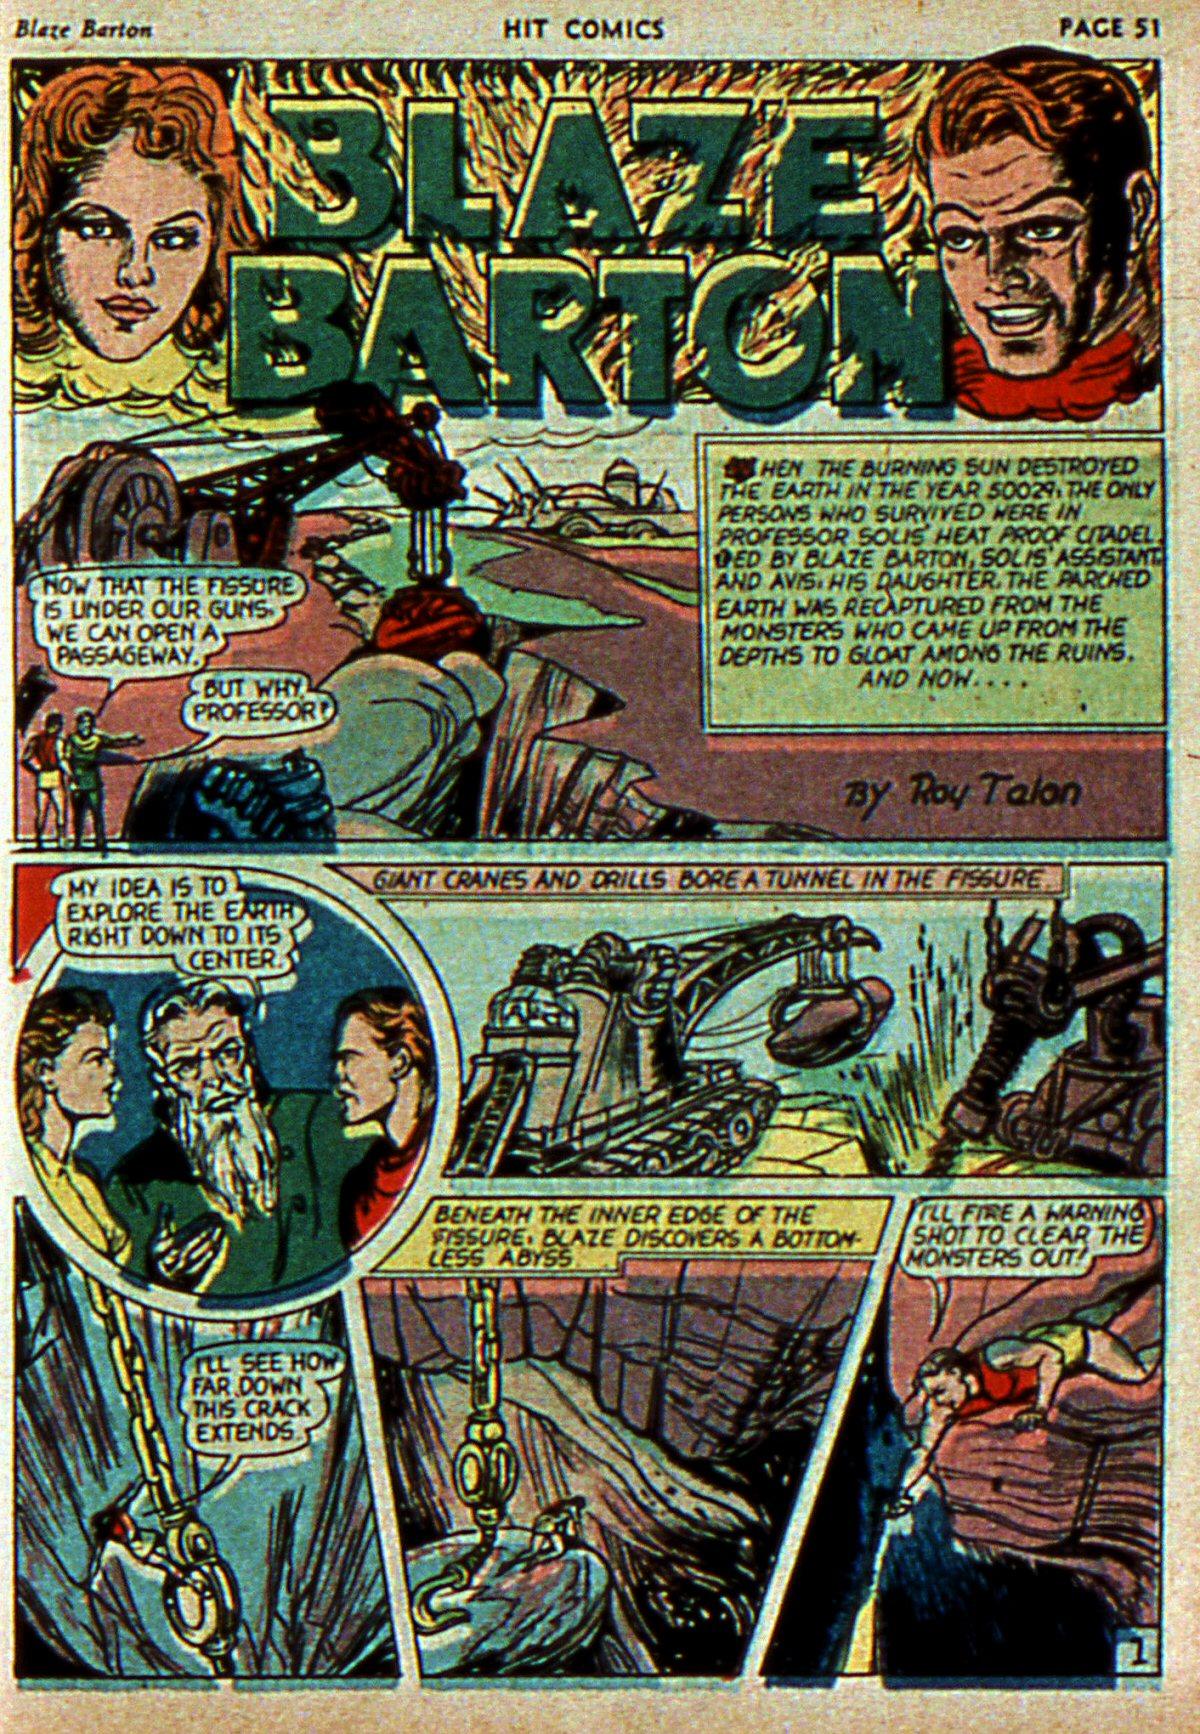 Read online Hit Comics comic -  Issue #3 - 53